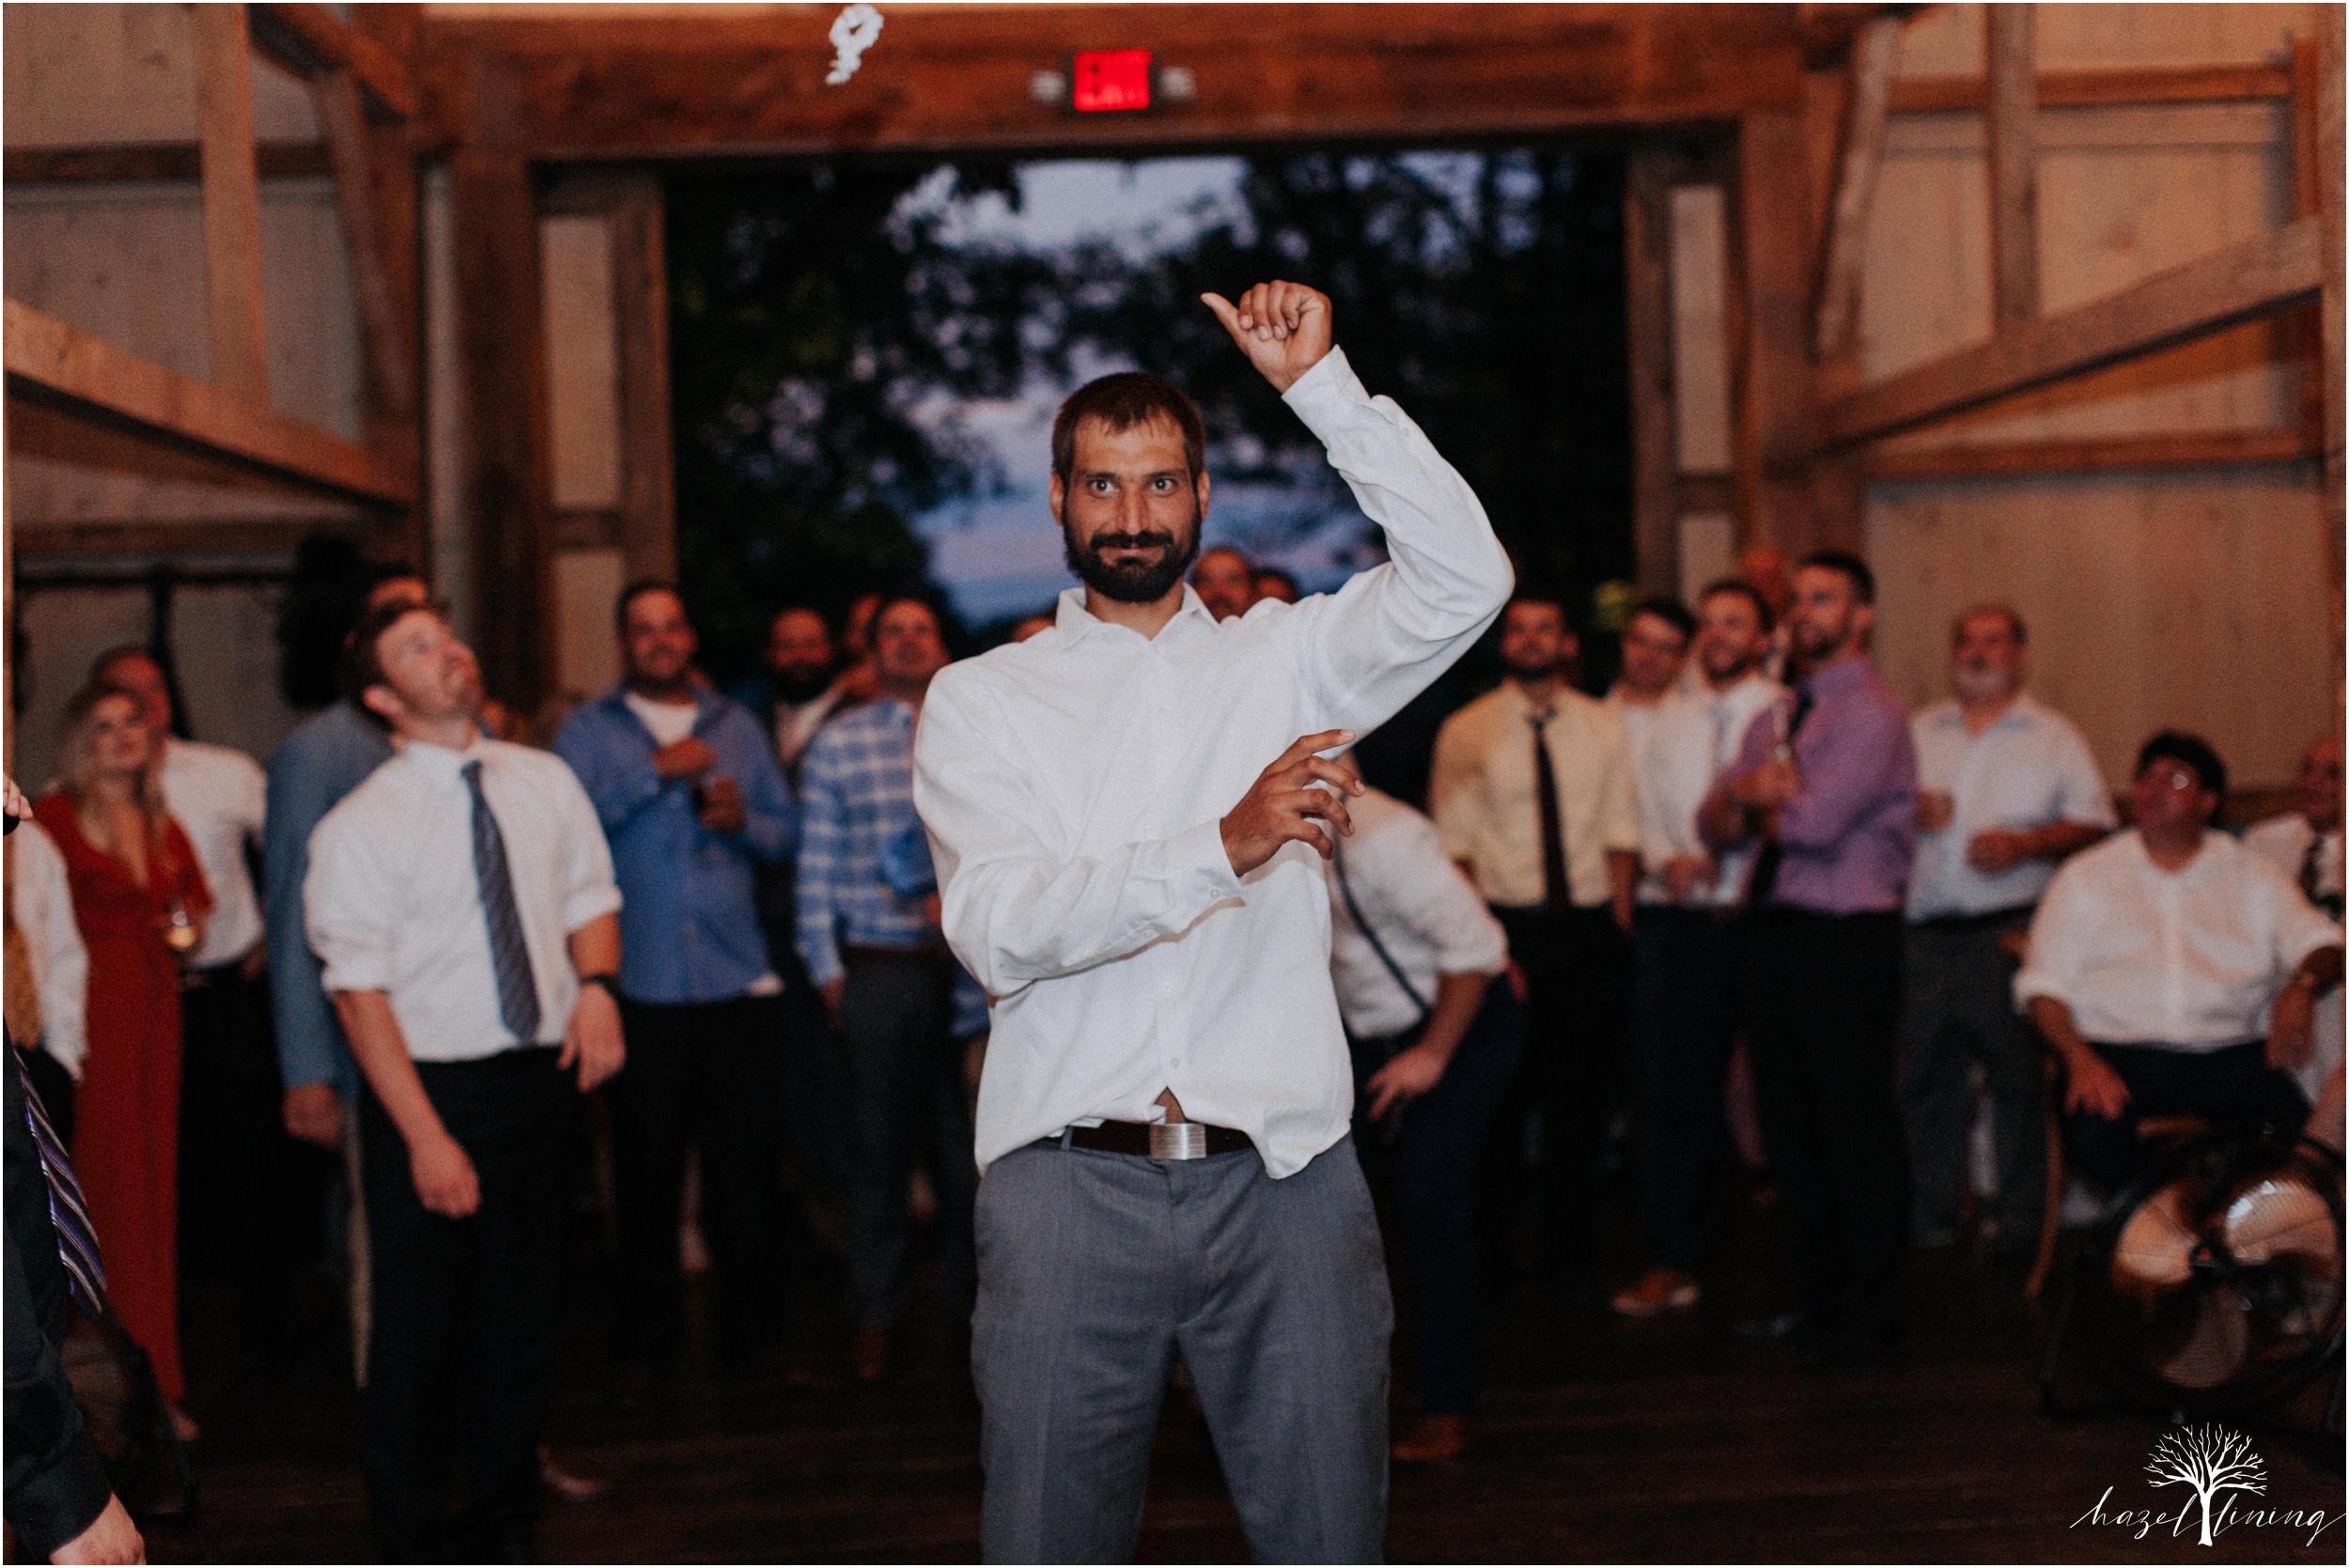 hazel-lining-travel-wedding-elopement-photography-lisa-landon-shoemaker-the-farm-bakery-and-events-bucks-county-quakertown-pennsylvania-summer-country-outdoor-farm-wedding_0169.jpg